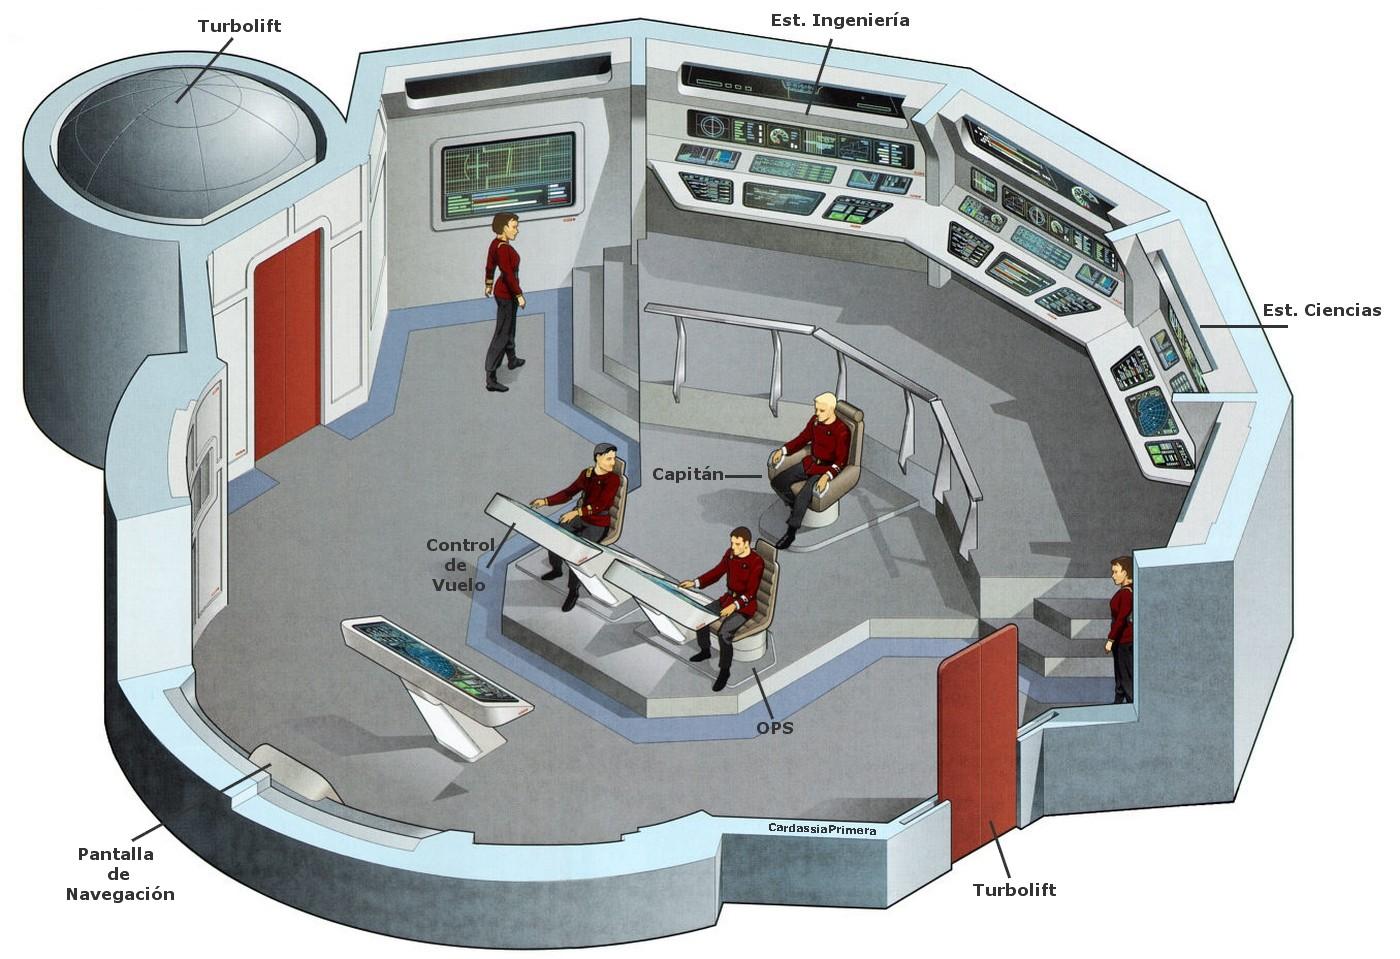 star trek starships bridges interiors schematics blueprints. Black Bedroom Furniture Sets. Home Design Ideas